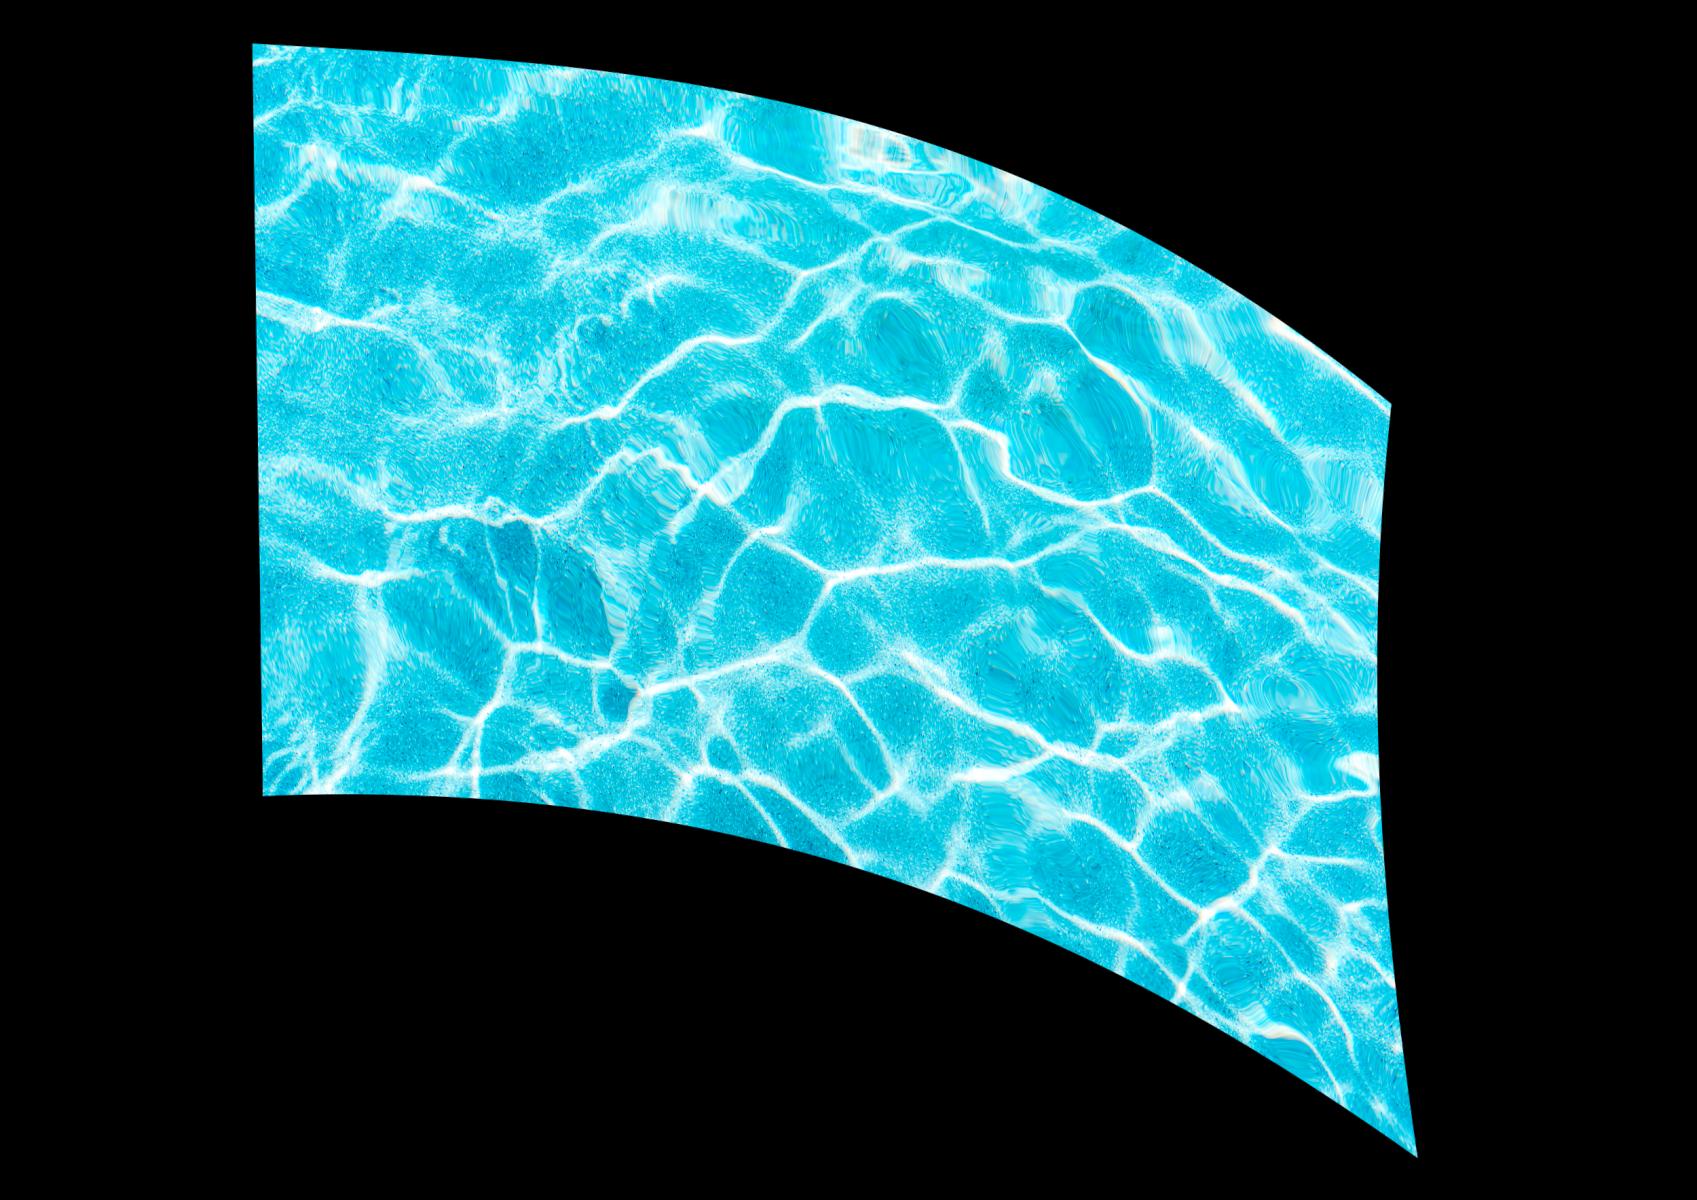 040304s - 36x54 Standard Summer Pool Water